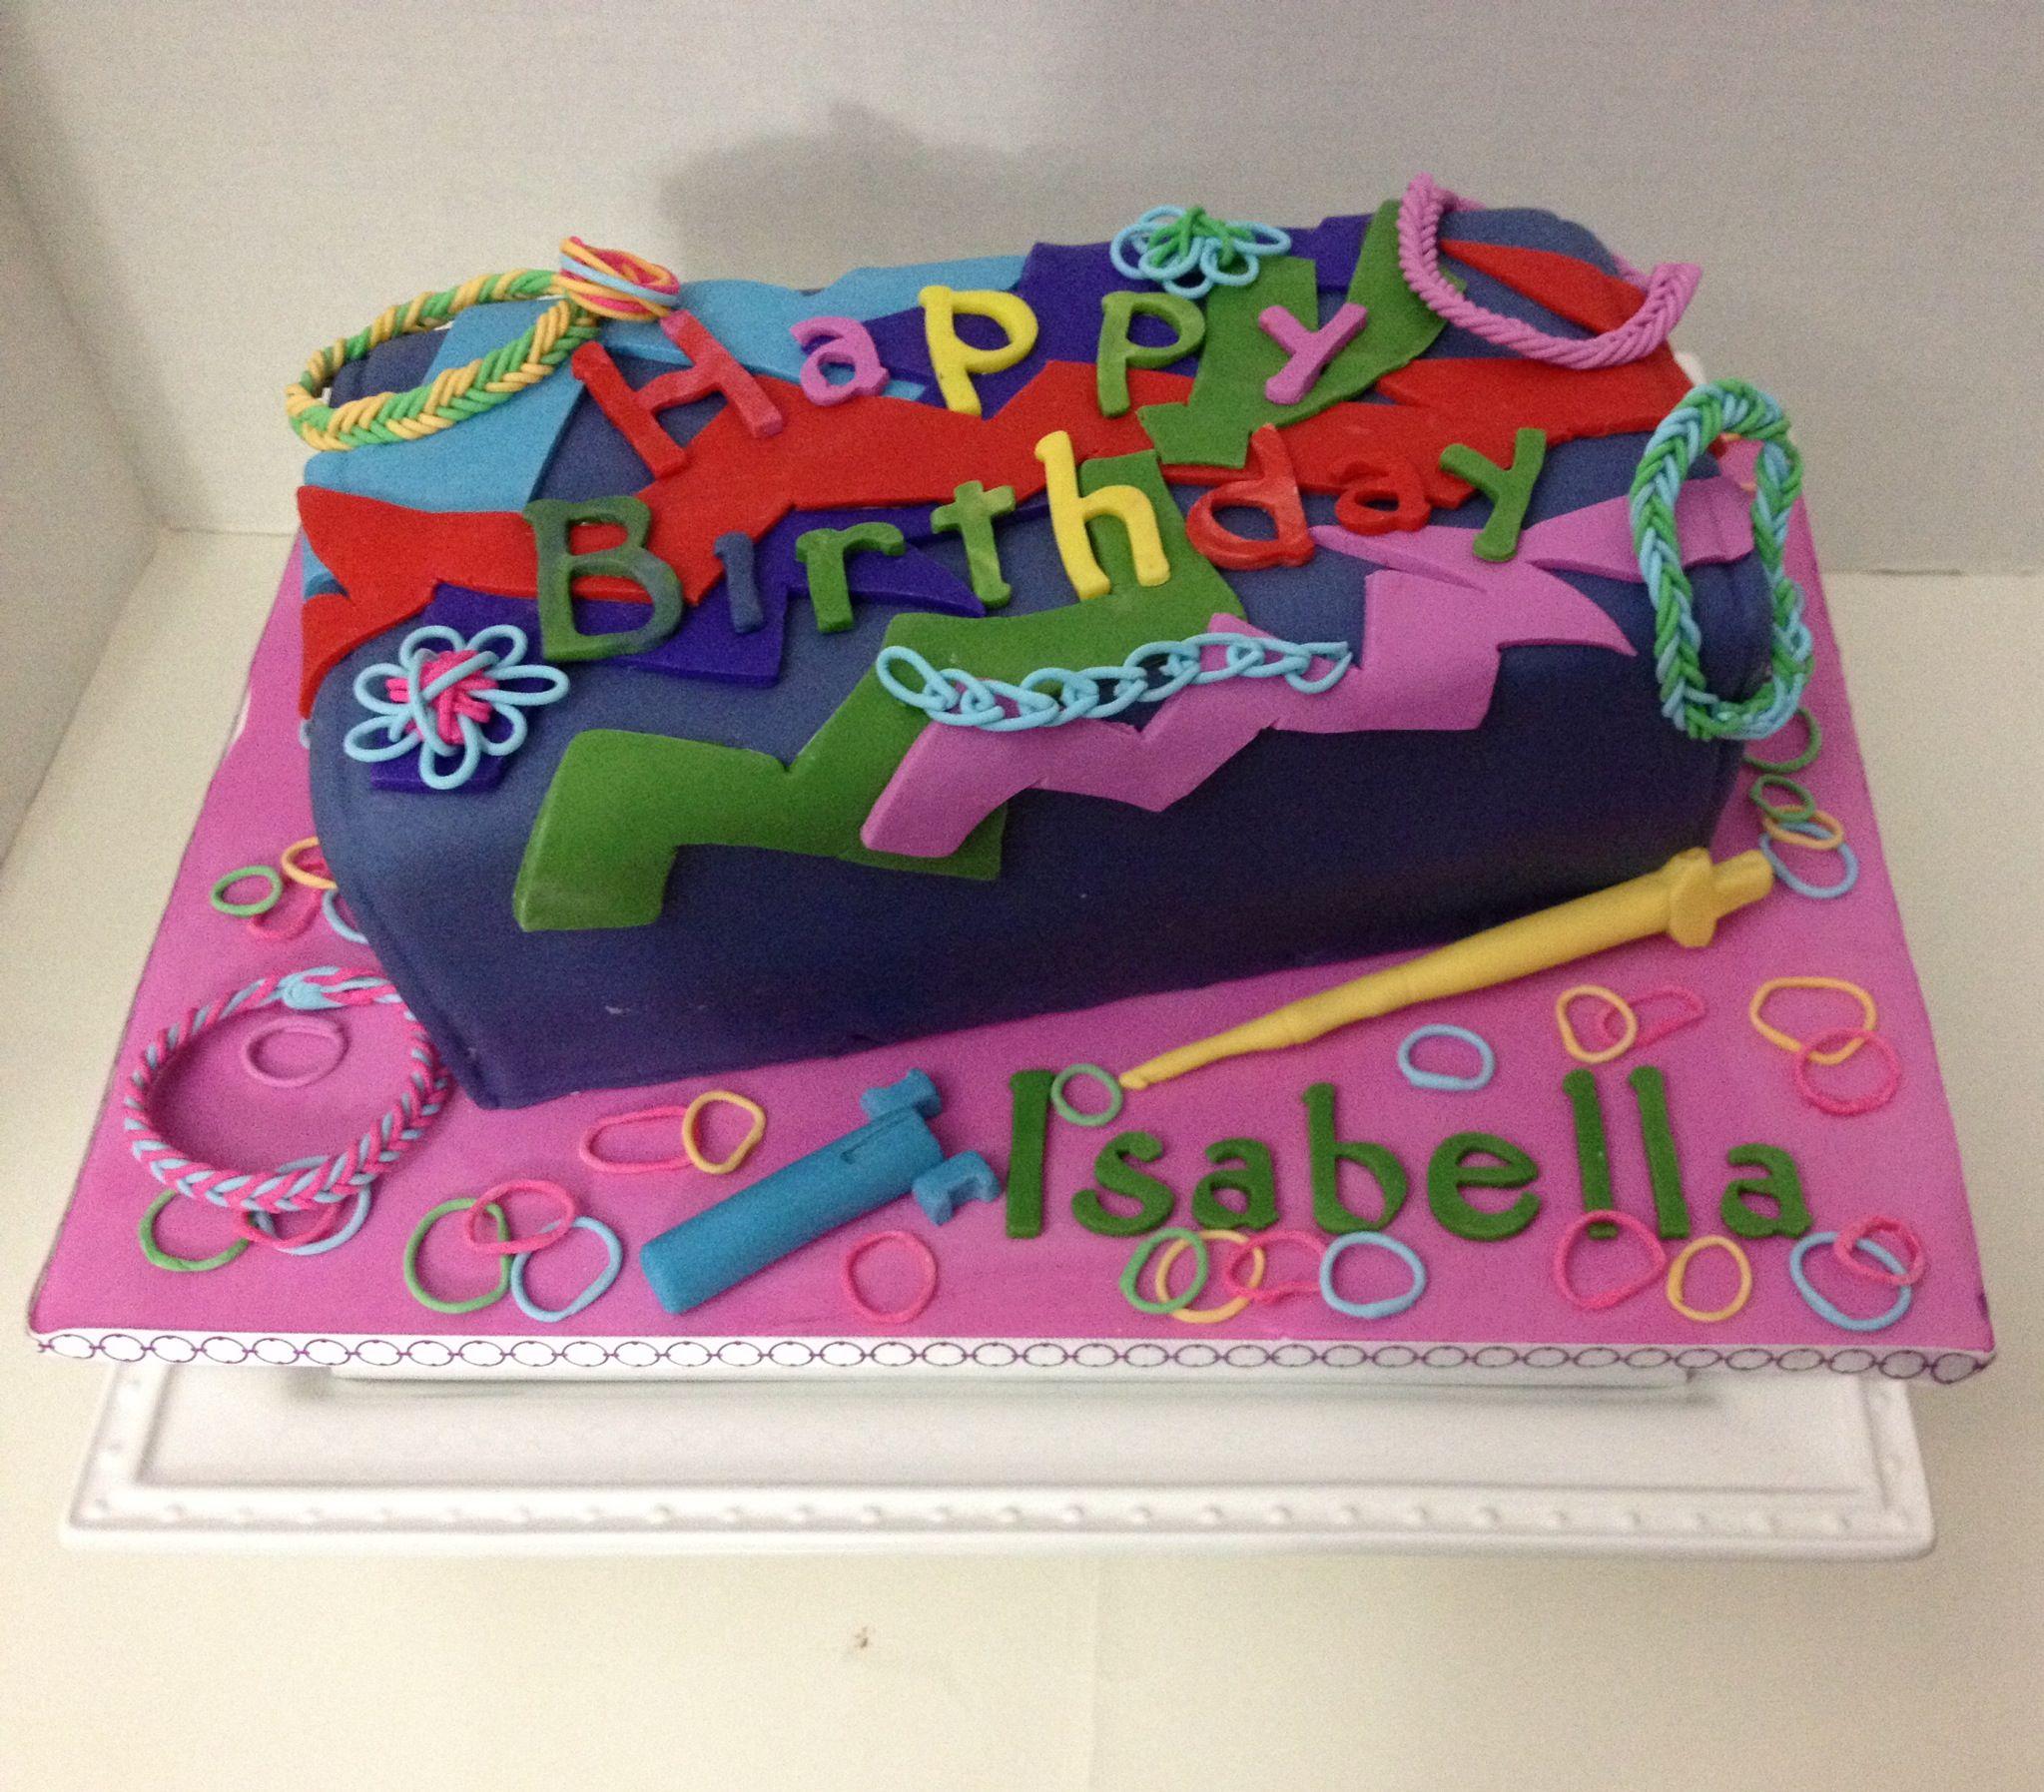 Cake Similar Artists : Rainbow Loom Cake!! http://www.mastermindtoys.com/Rainbow ...